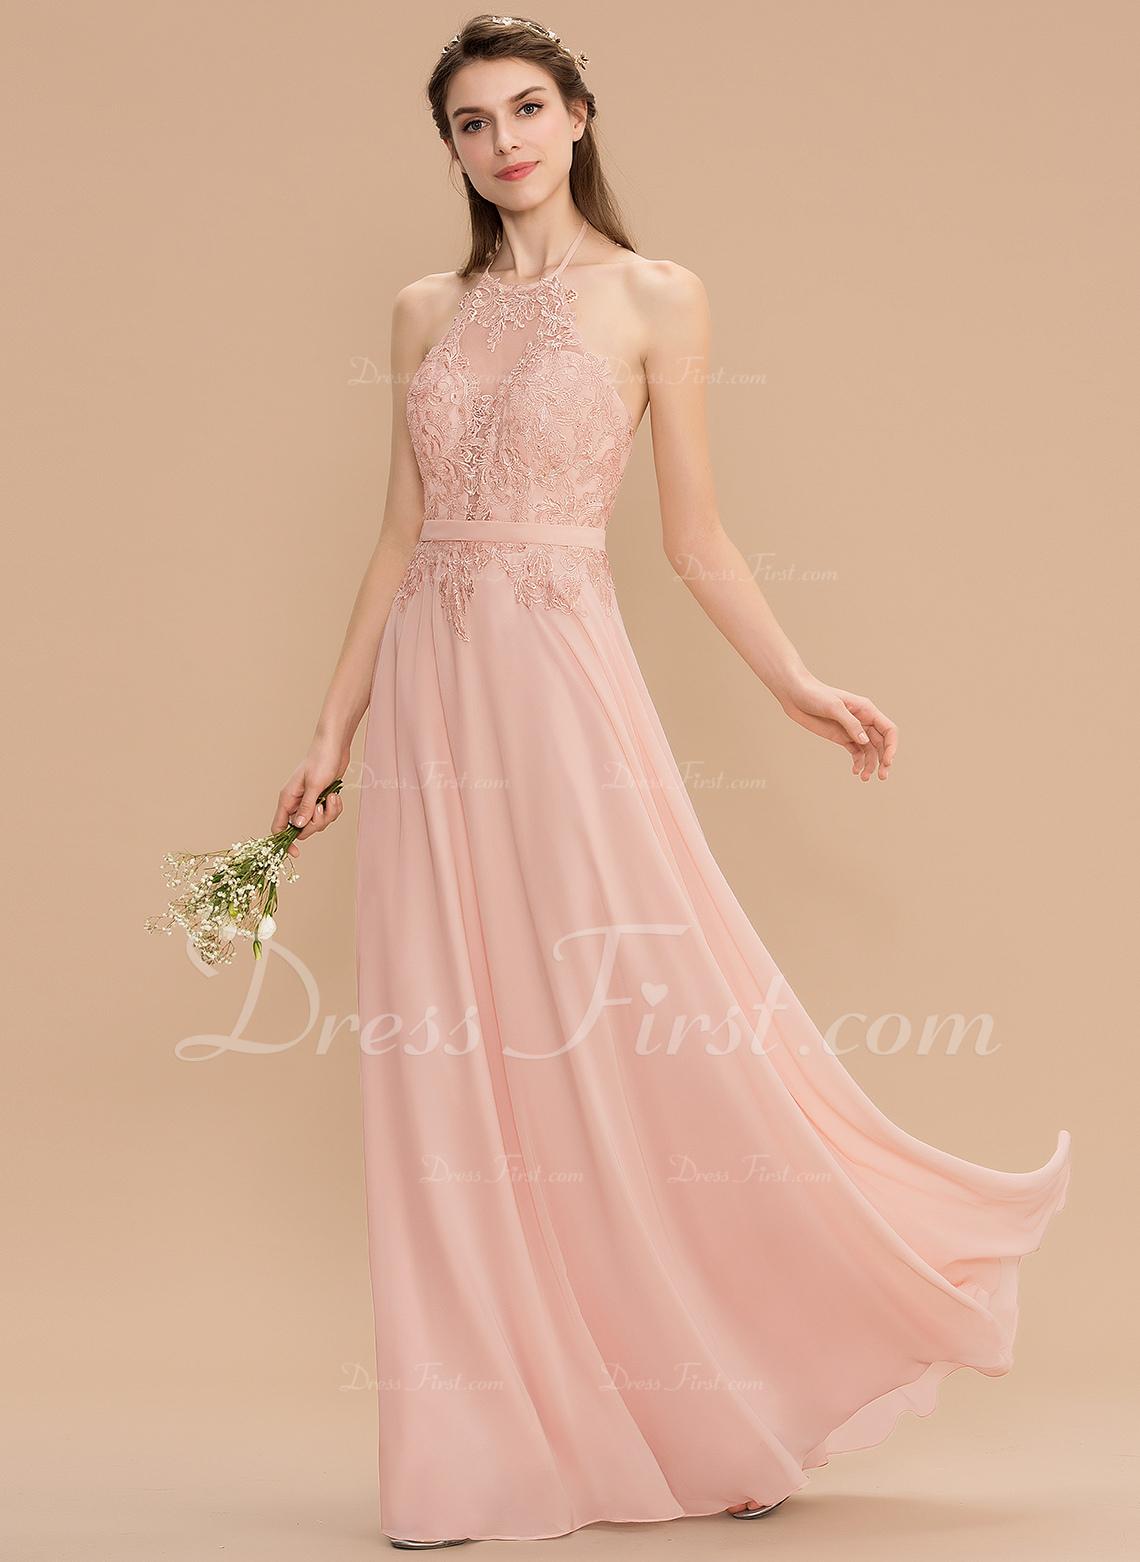 60ea3eebfb0 Bridesmaid Dresses   176763. Loading zoom. Loading. Color  Pearl Pink. A-Line  Halter Floor-Length Chiffon Lace ...